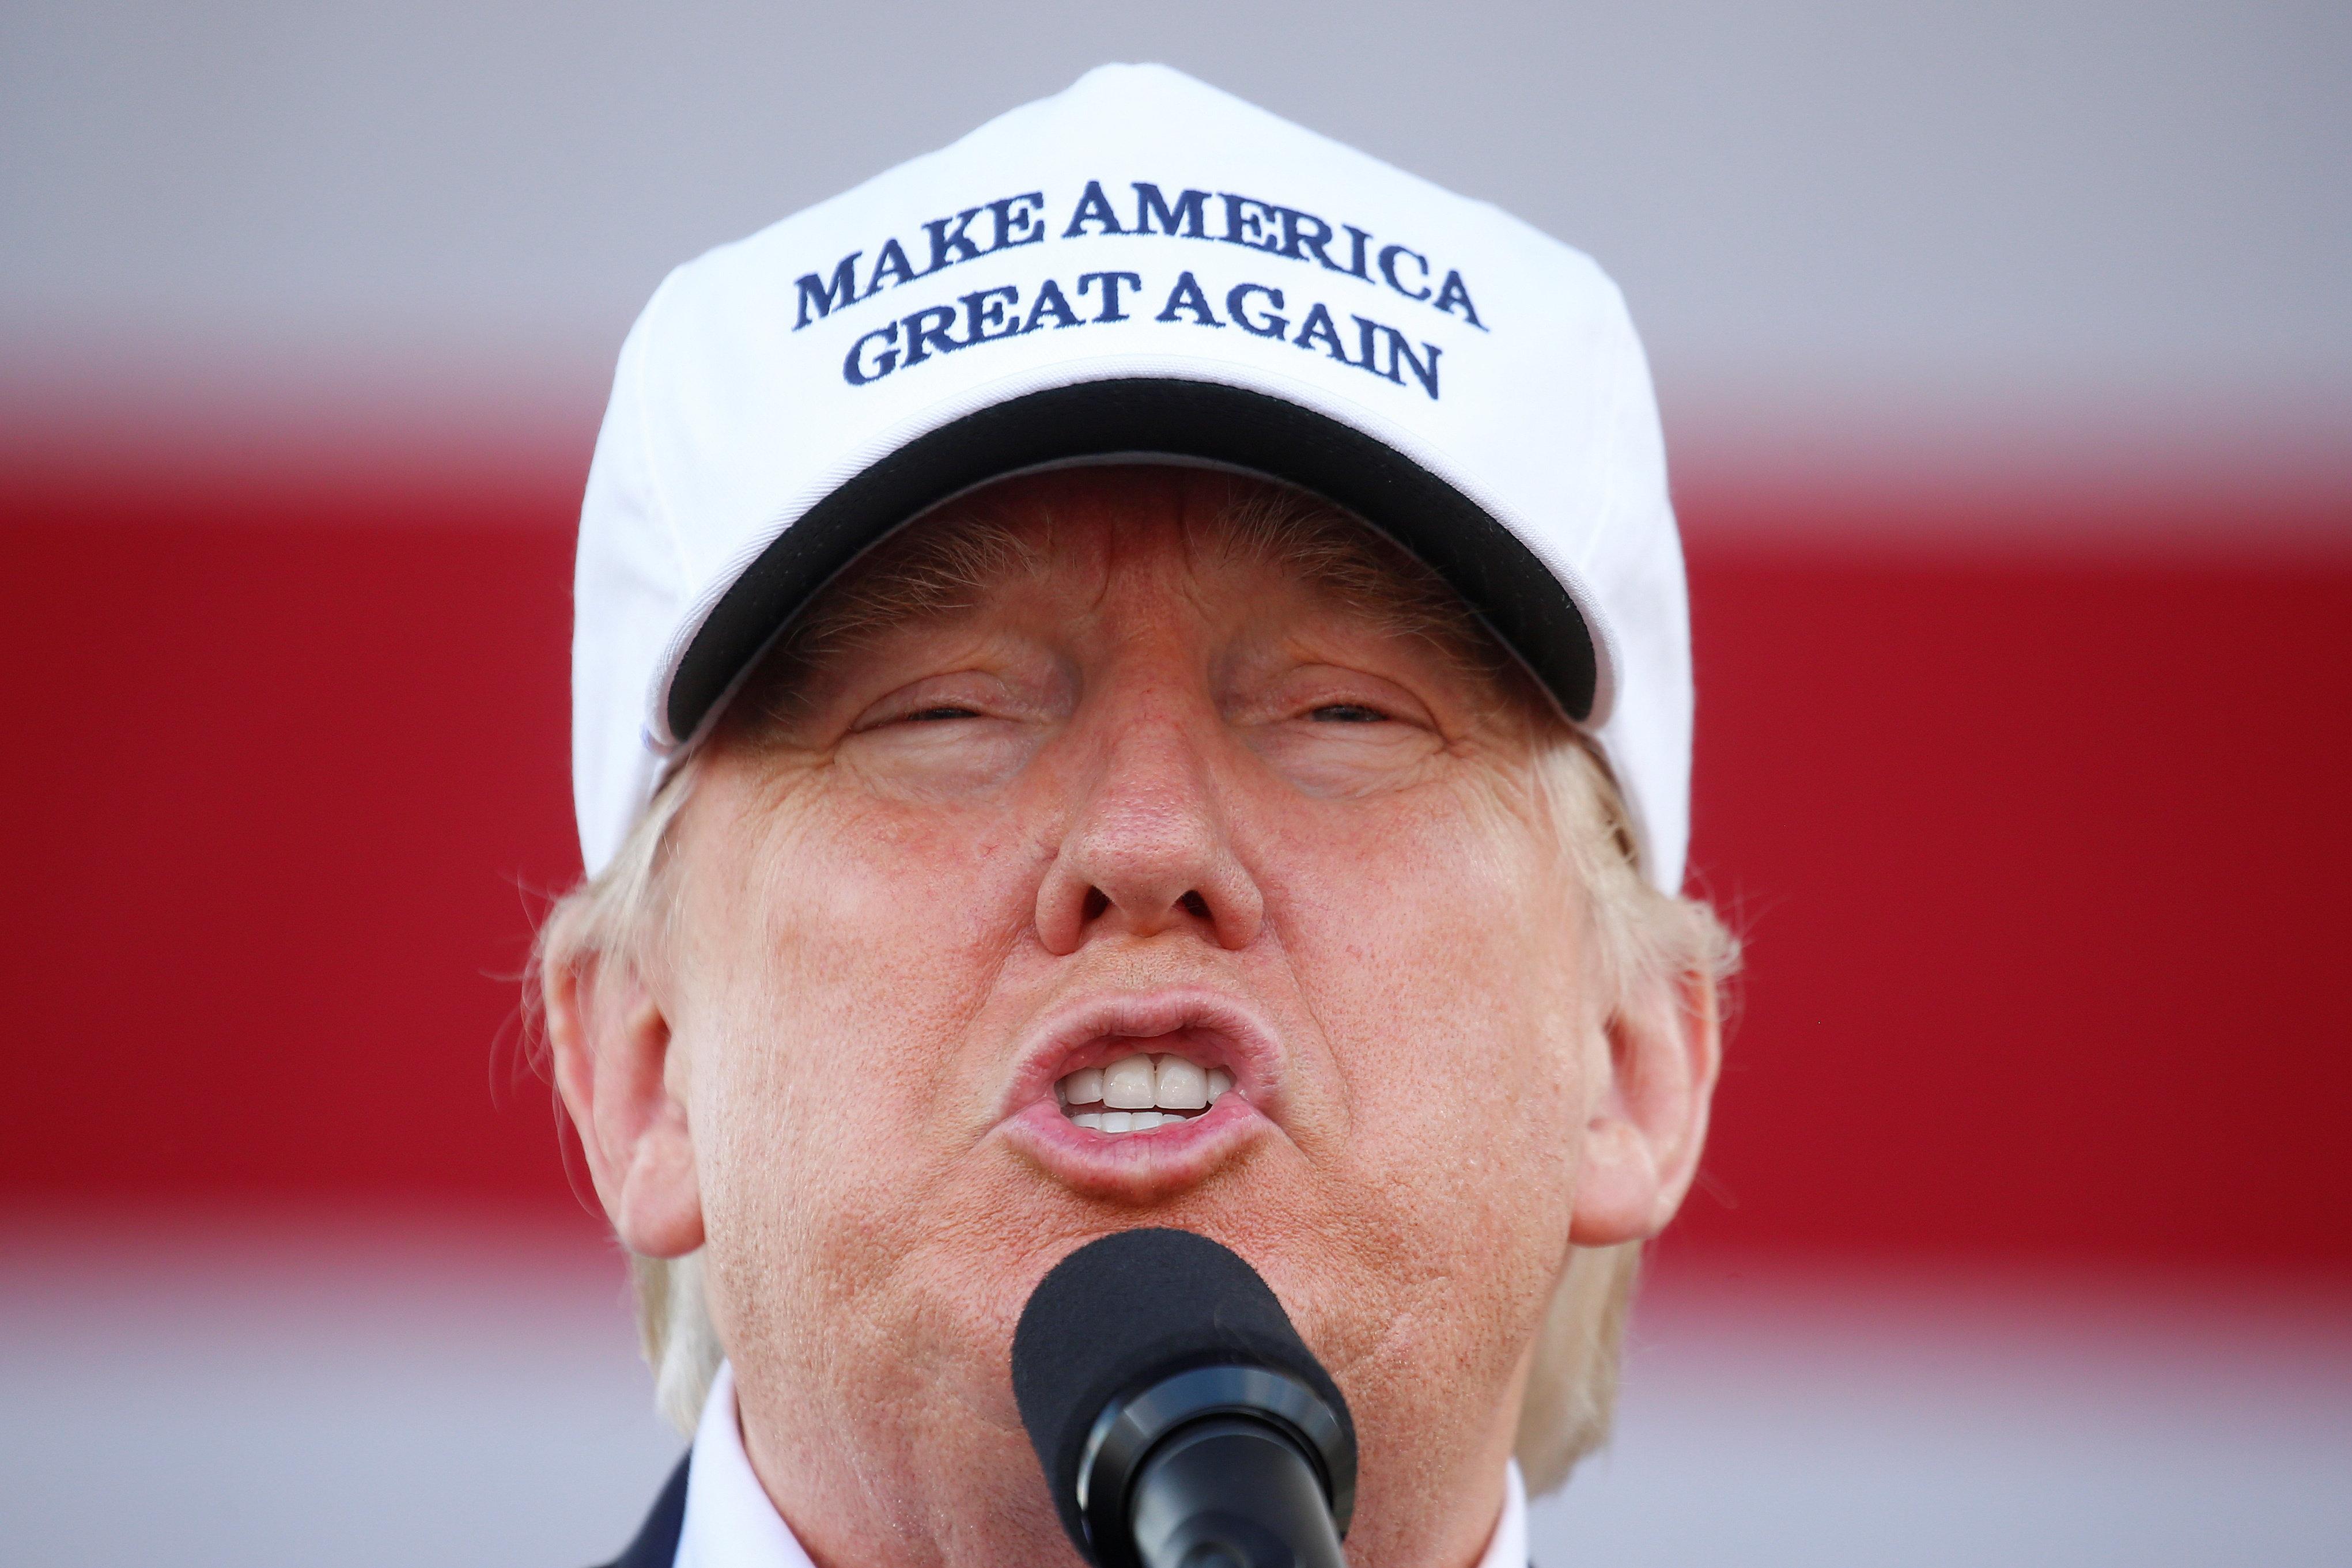 Republican presidential nominee Donald Trump holds a campaign event in Miami, Florida U.S. November 2,  2016.   REUTERS/Carlo Allegri